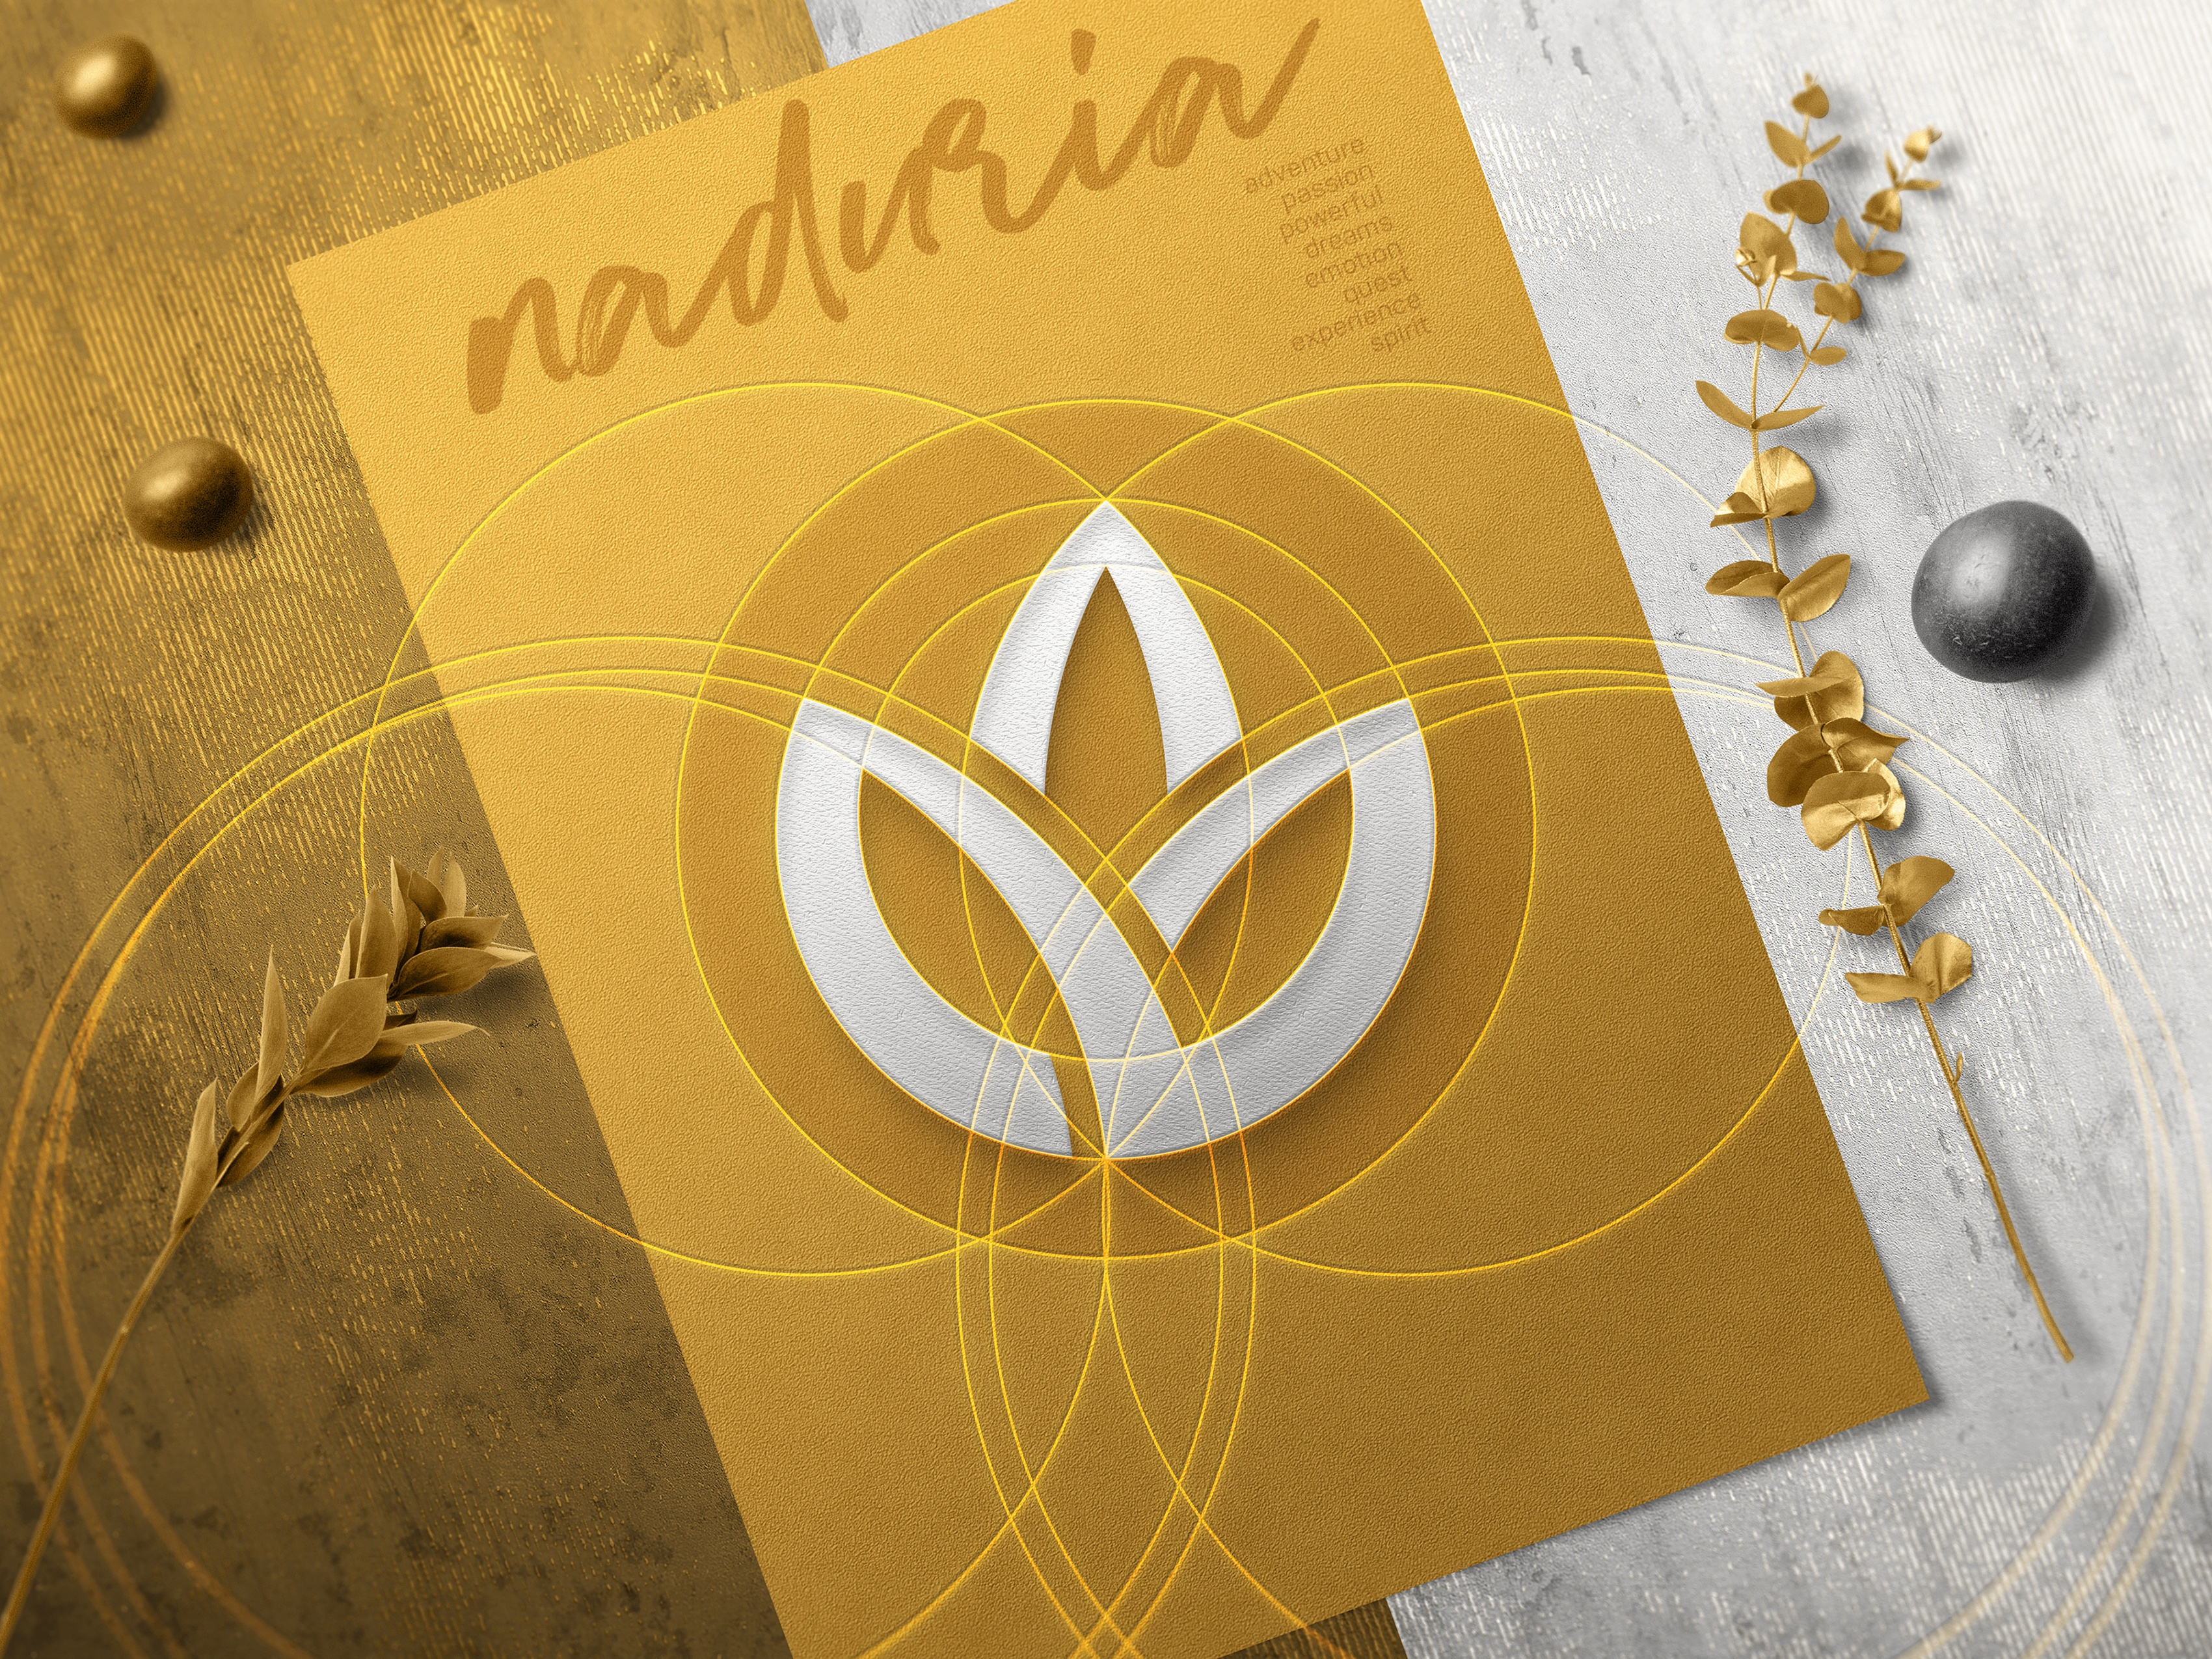 Naduria     logotype construction concept v.1.1 3400x2550